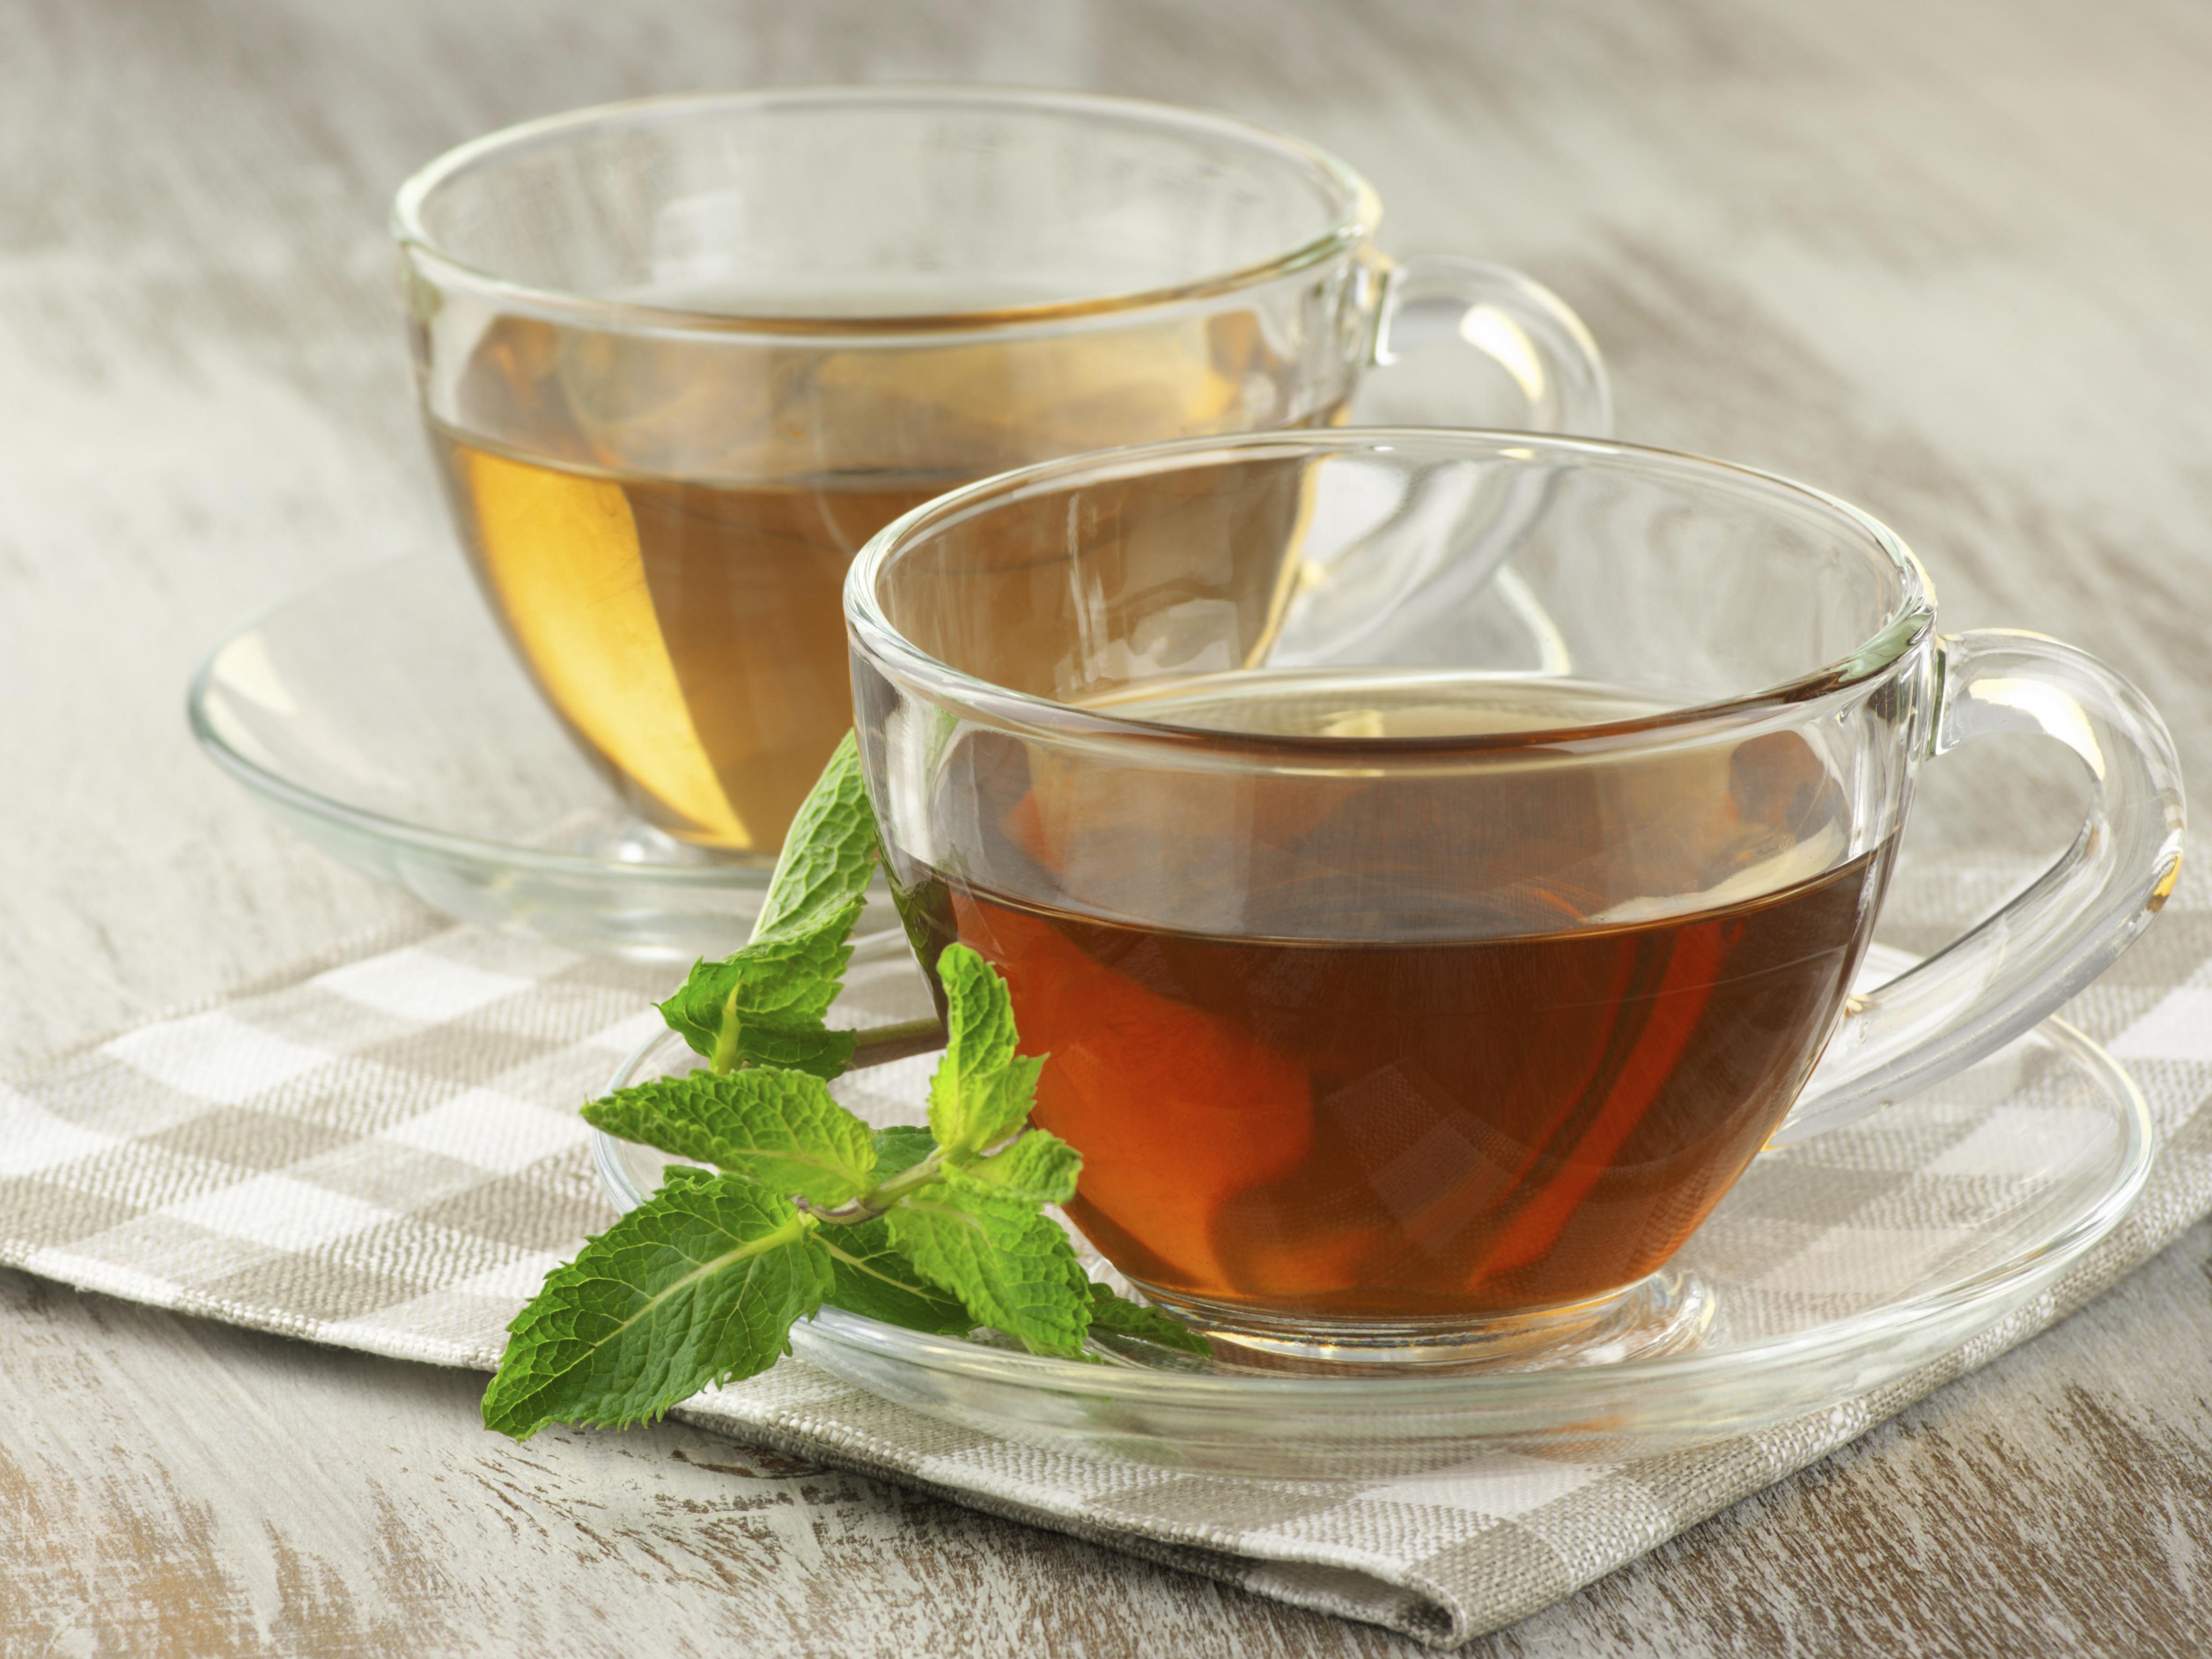 Ancient herbal tea may induce sleep and a longer life